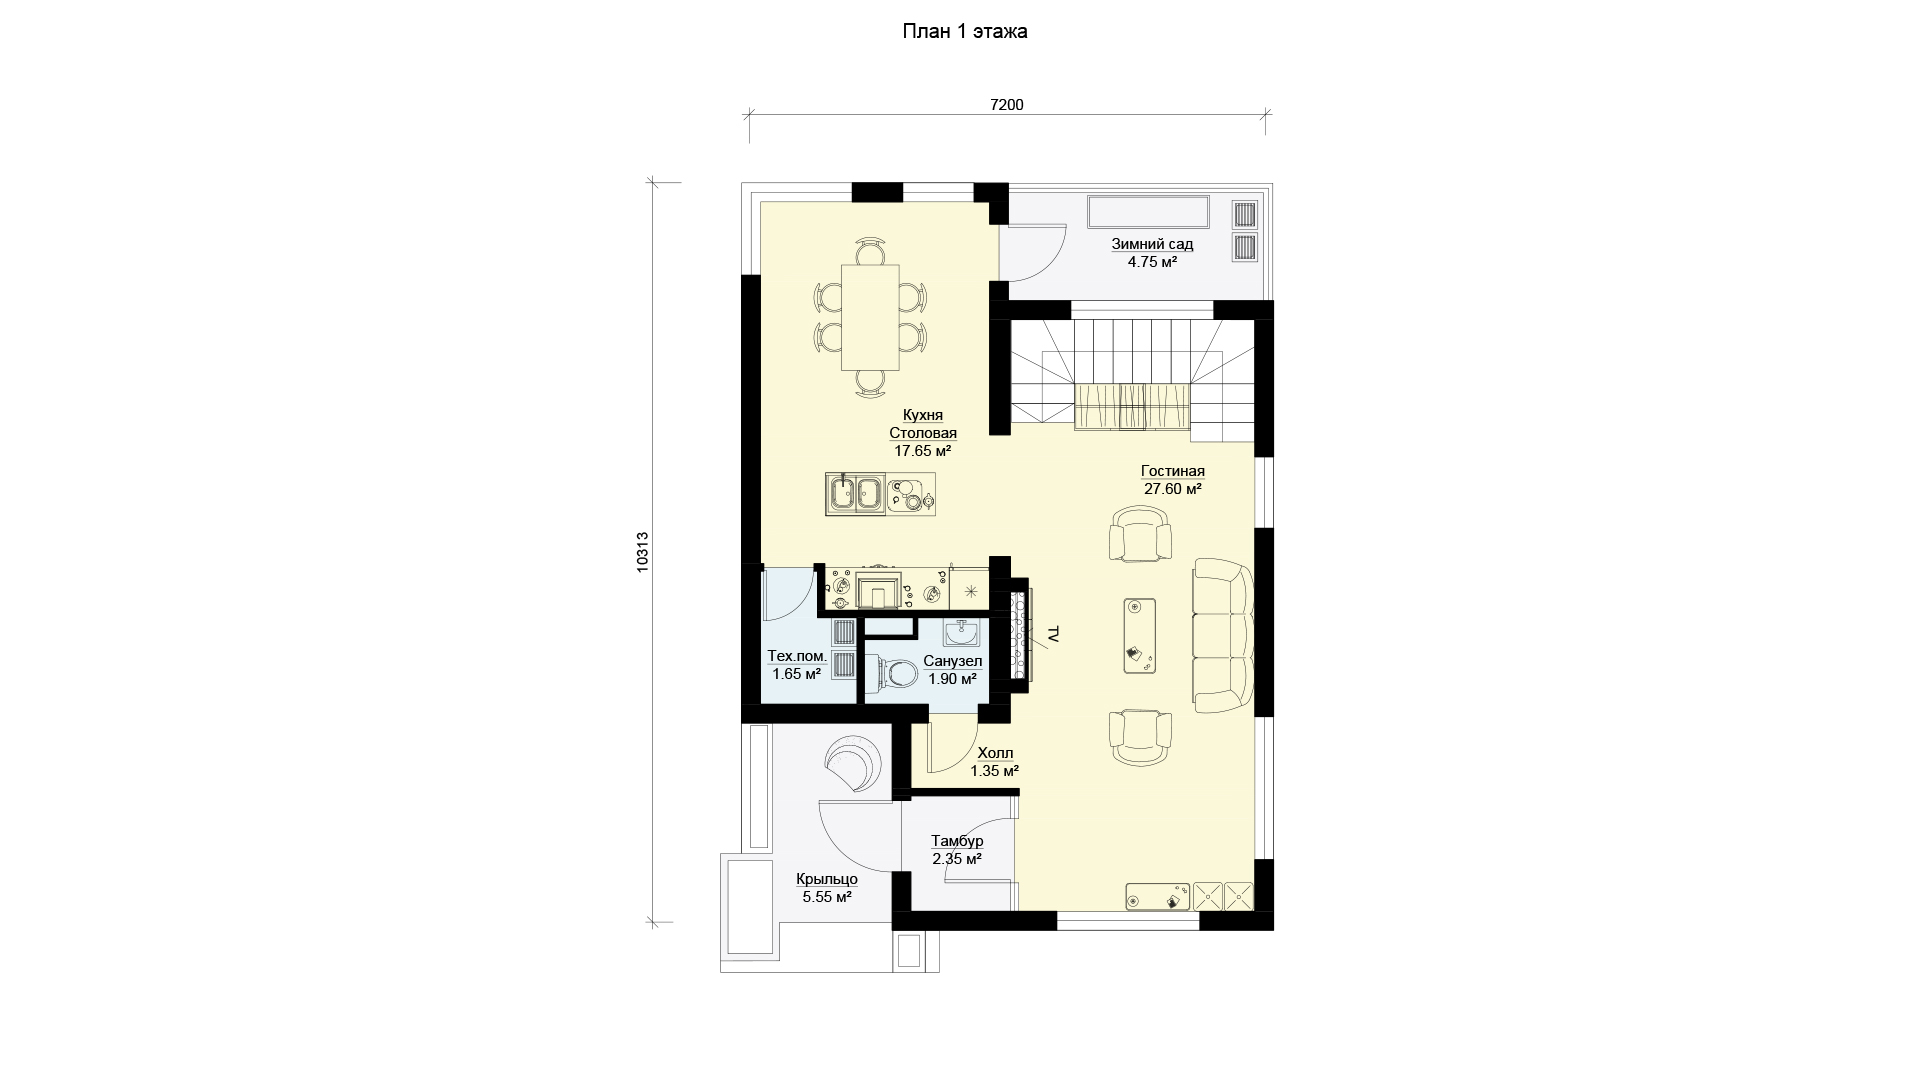 План первого этажа дома 7 на 10 двухэтажного, проект БЭНПАН МС-112.